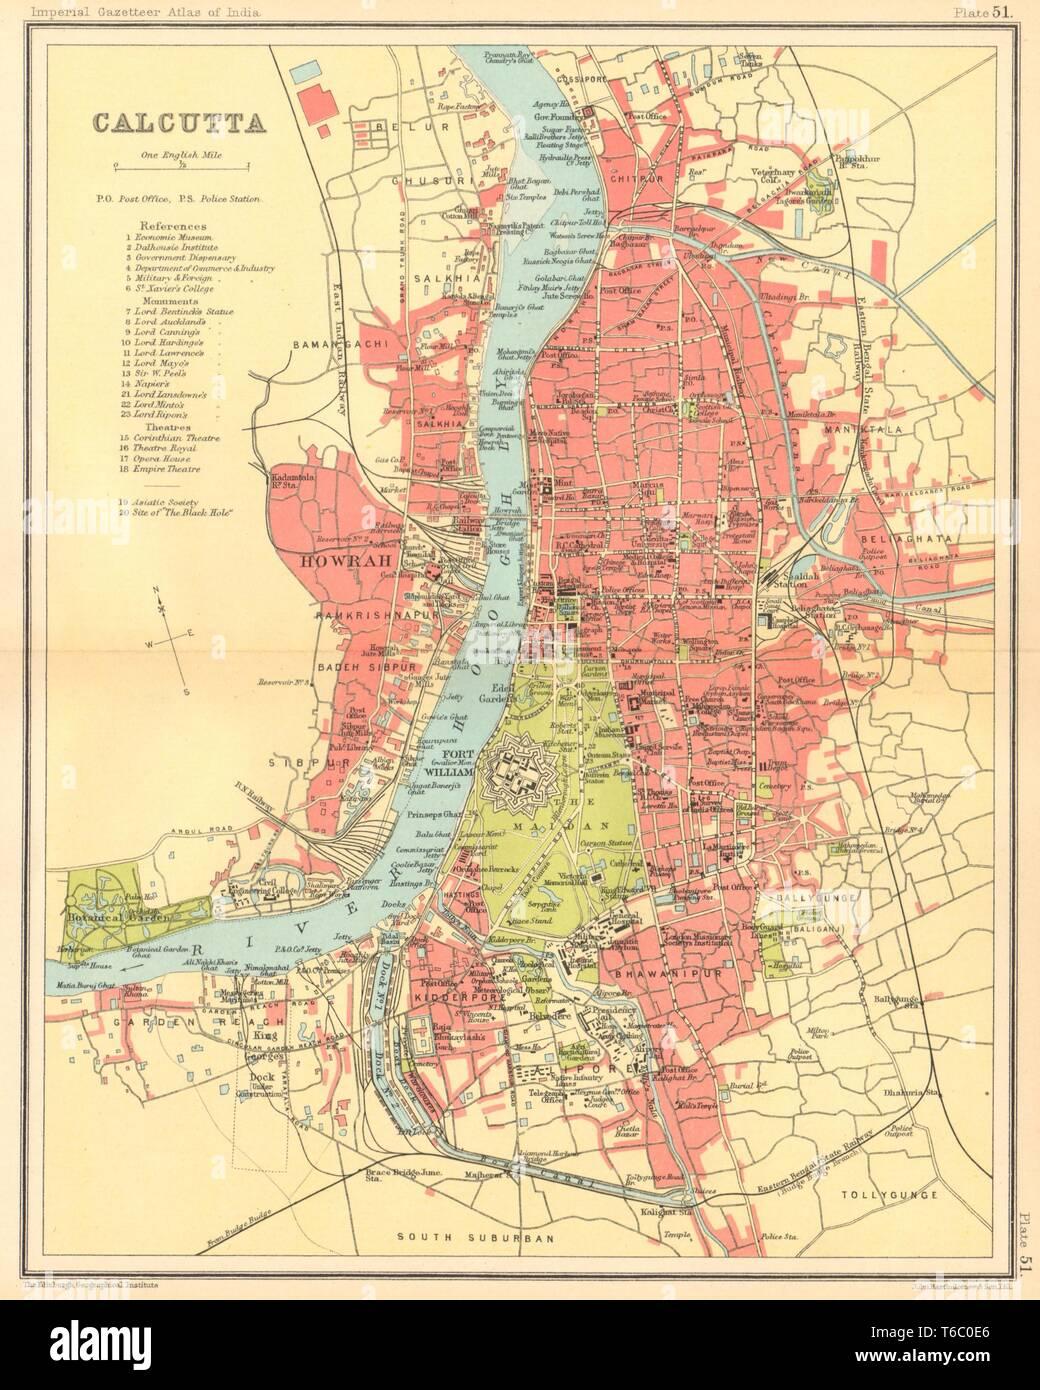 Calcutta / Kolkata town city plan. Fort William. British India 1931 on